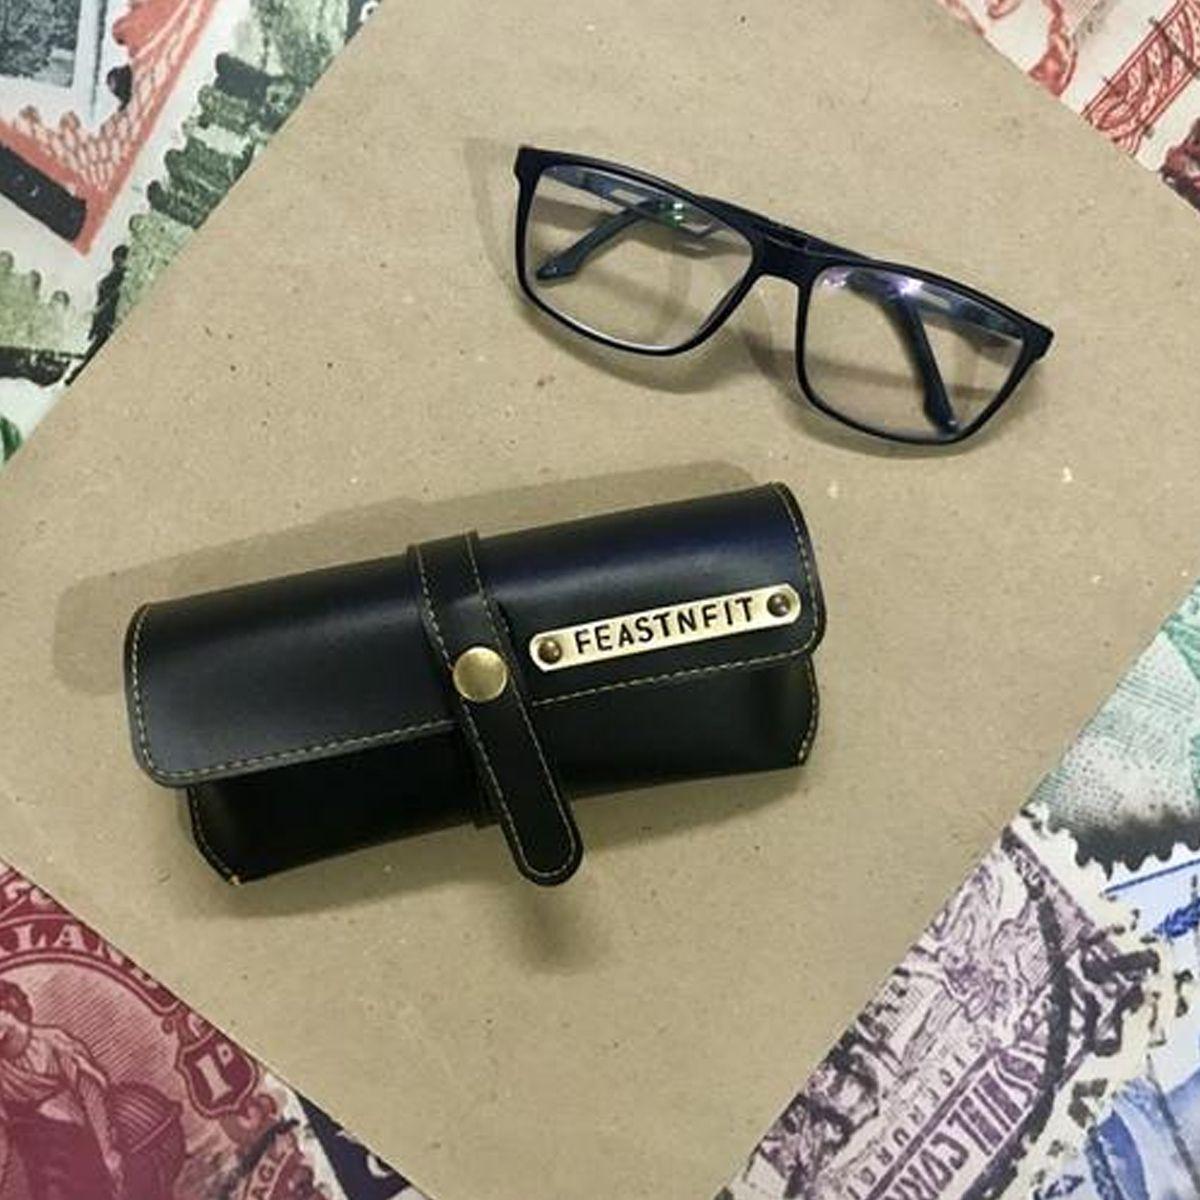 Eyewear Case Personalized Eyewear Glasses Eyeglasses Case Zestpics In 2020 Eye Wear Glasses Eyeglass Case Eyewear